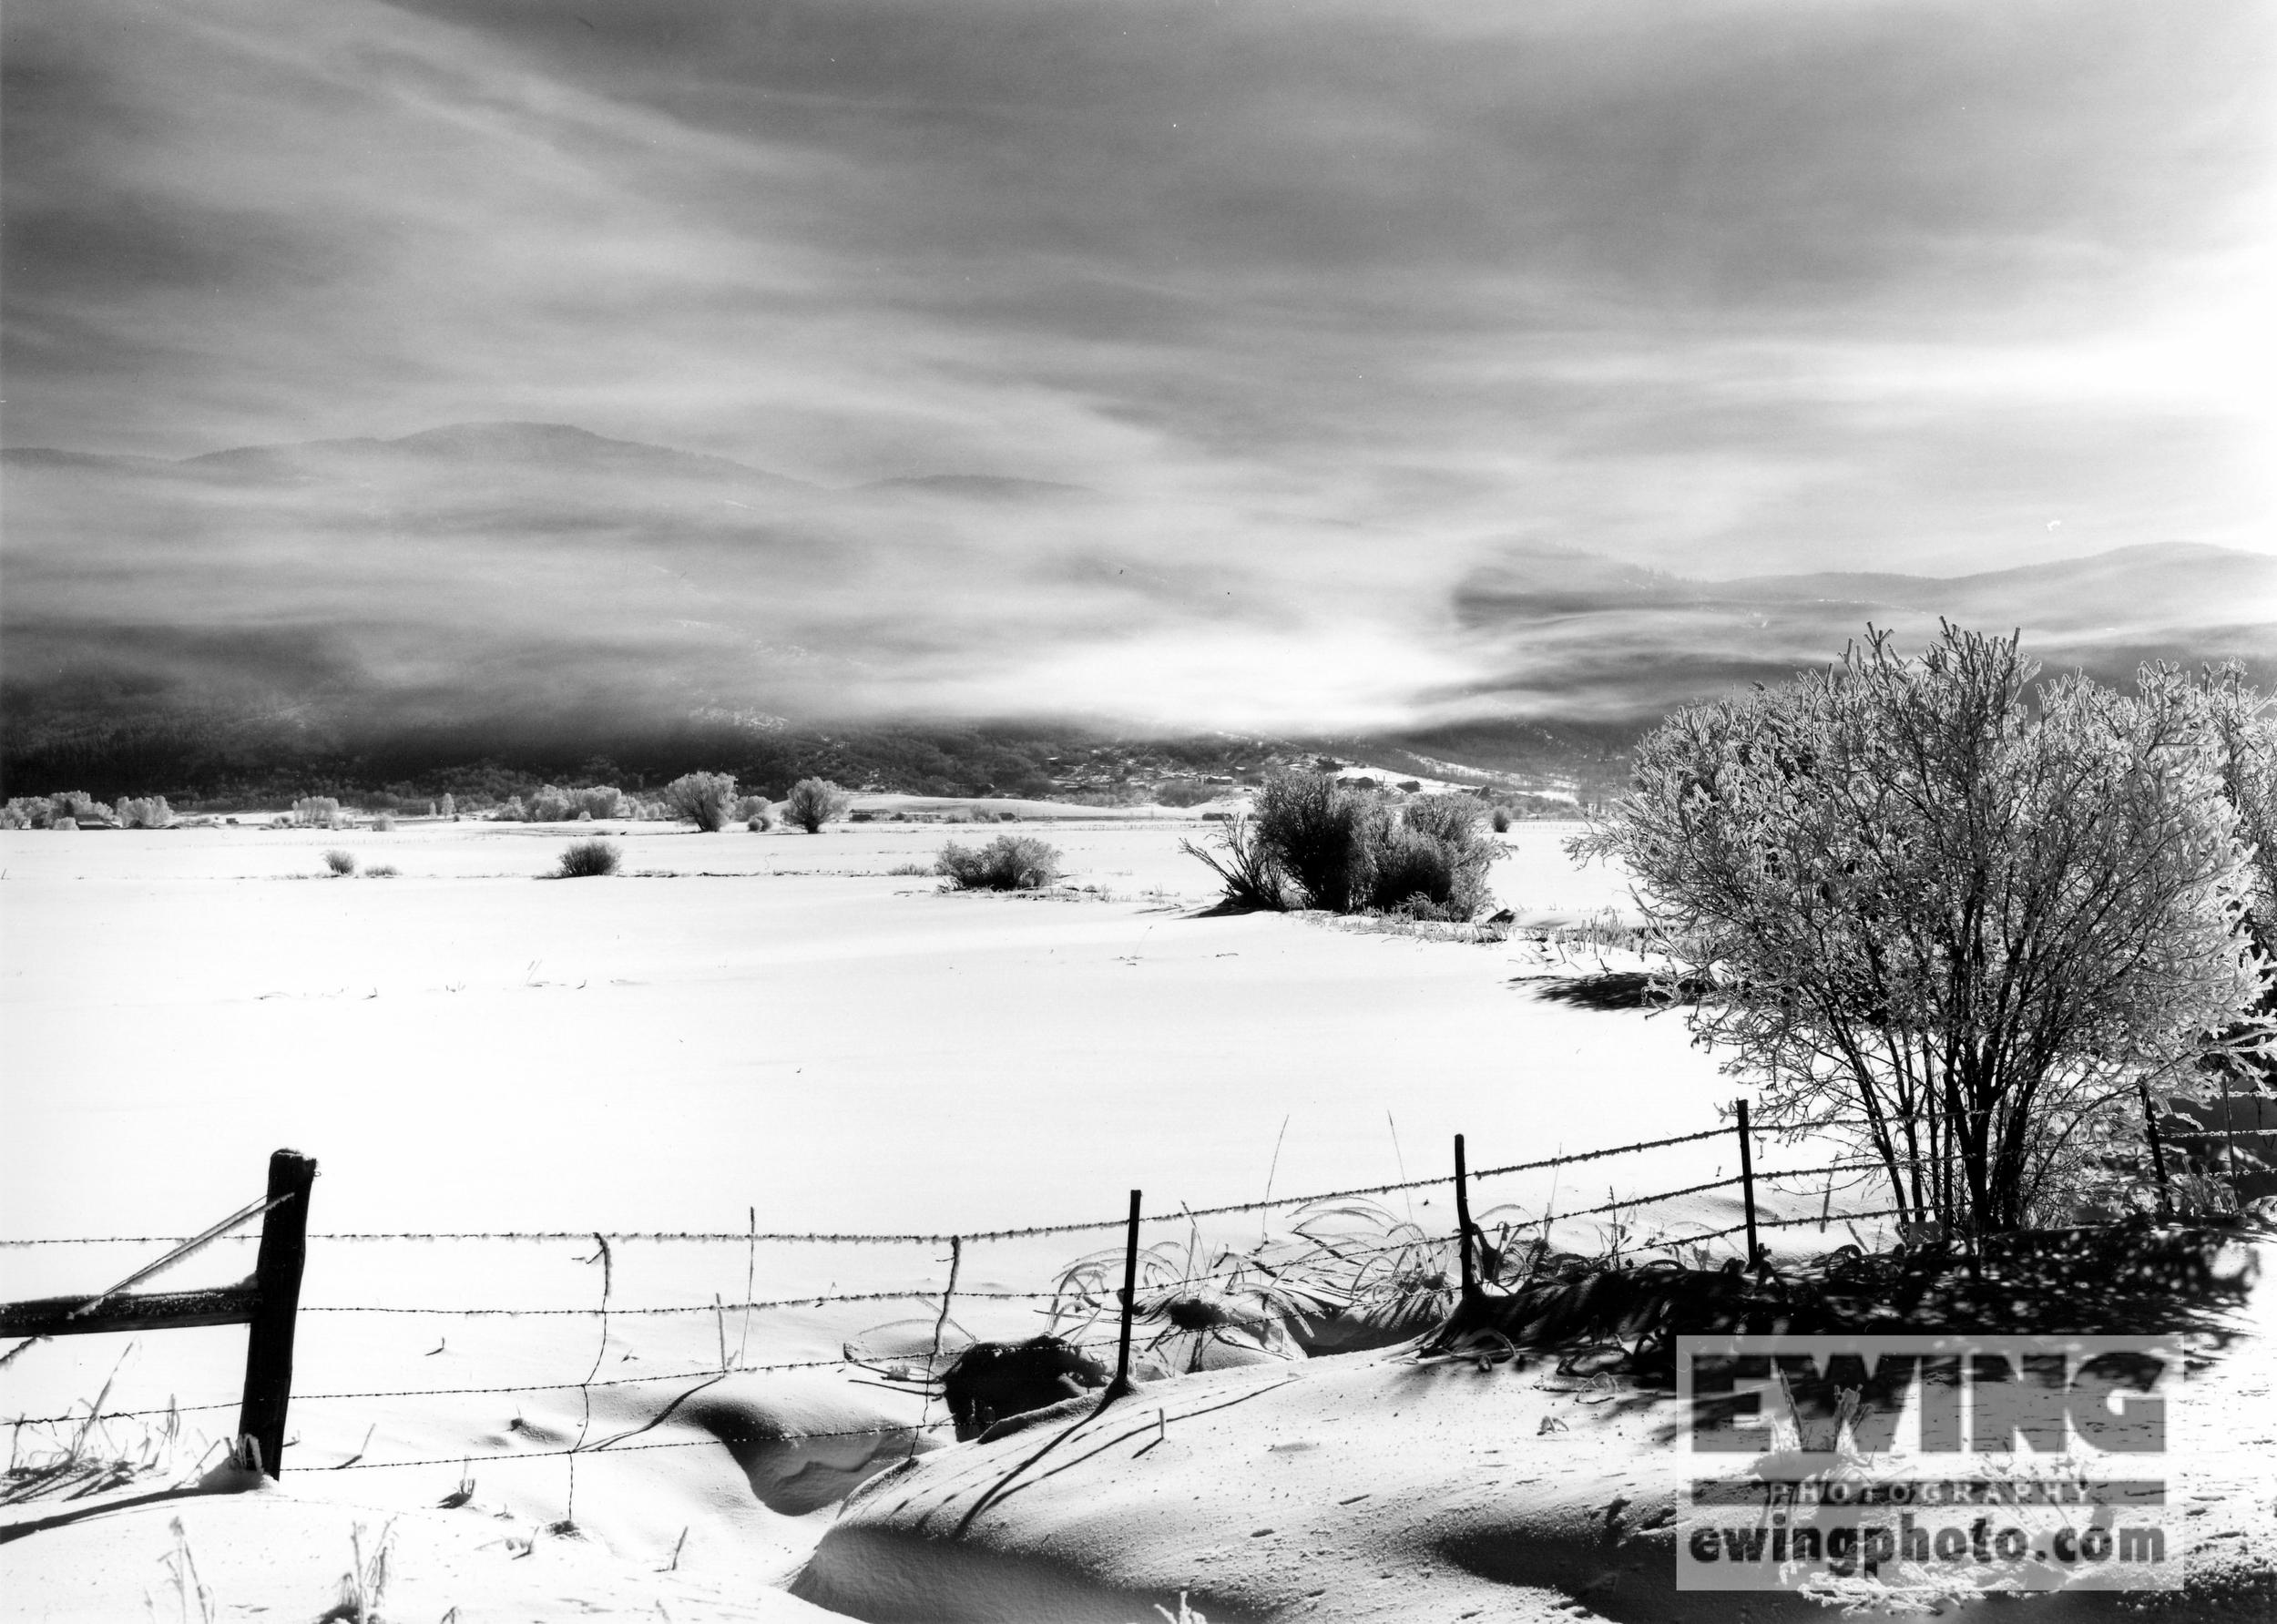 December Morning off Hwy 131 Steamboat Springs, Colorado